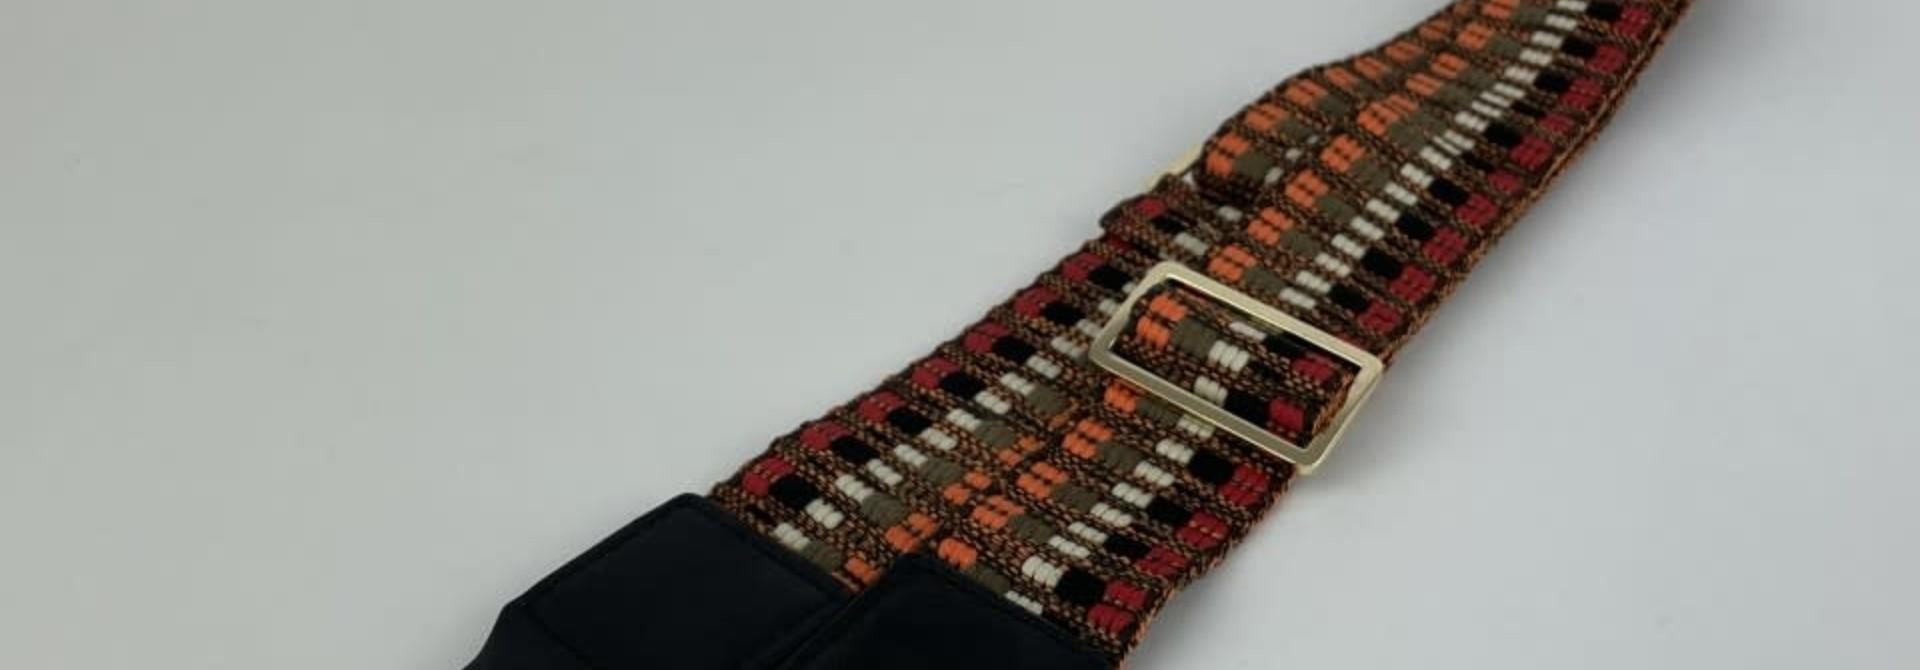 Ilmya woven shoulder strap Orange